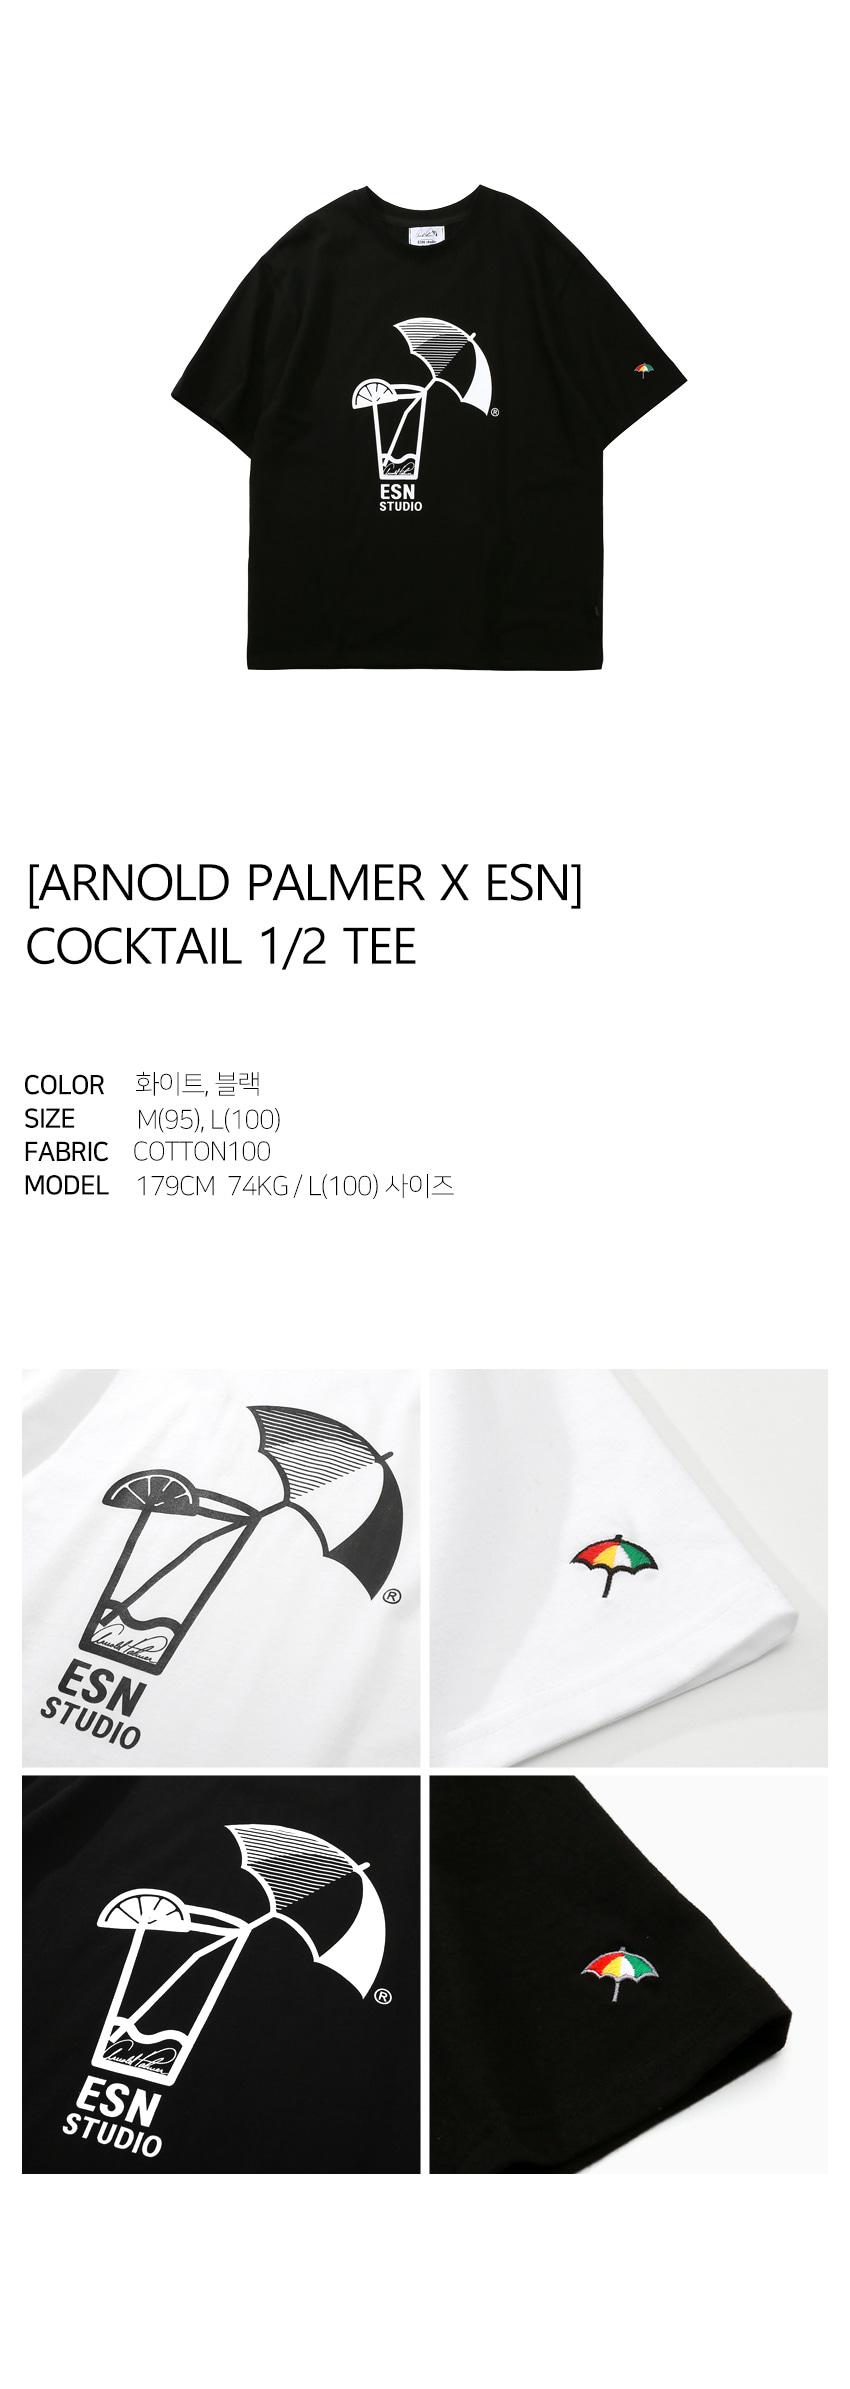 [ARNOLD PALMER X ESN] Cocktail 1/2 Tee black